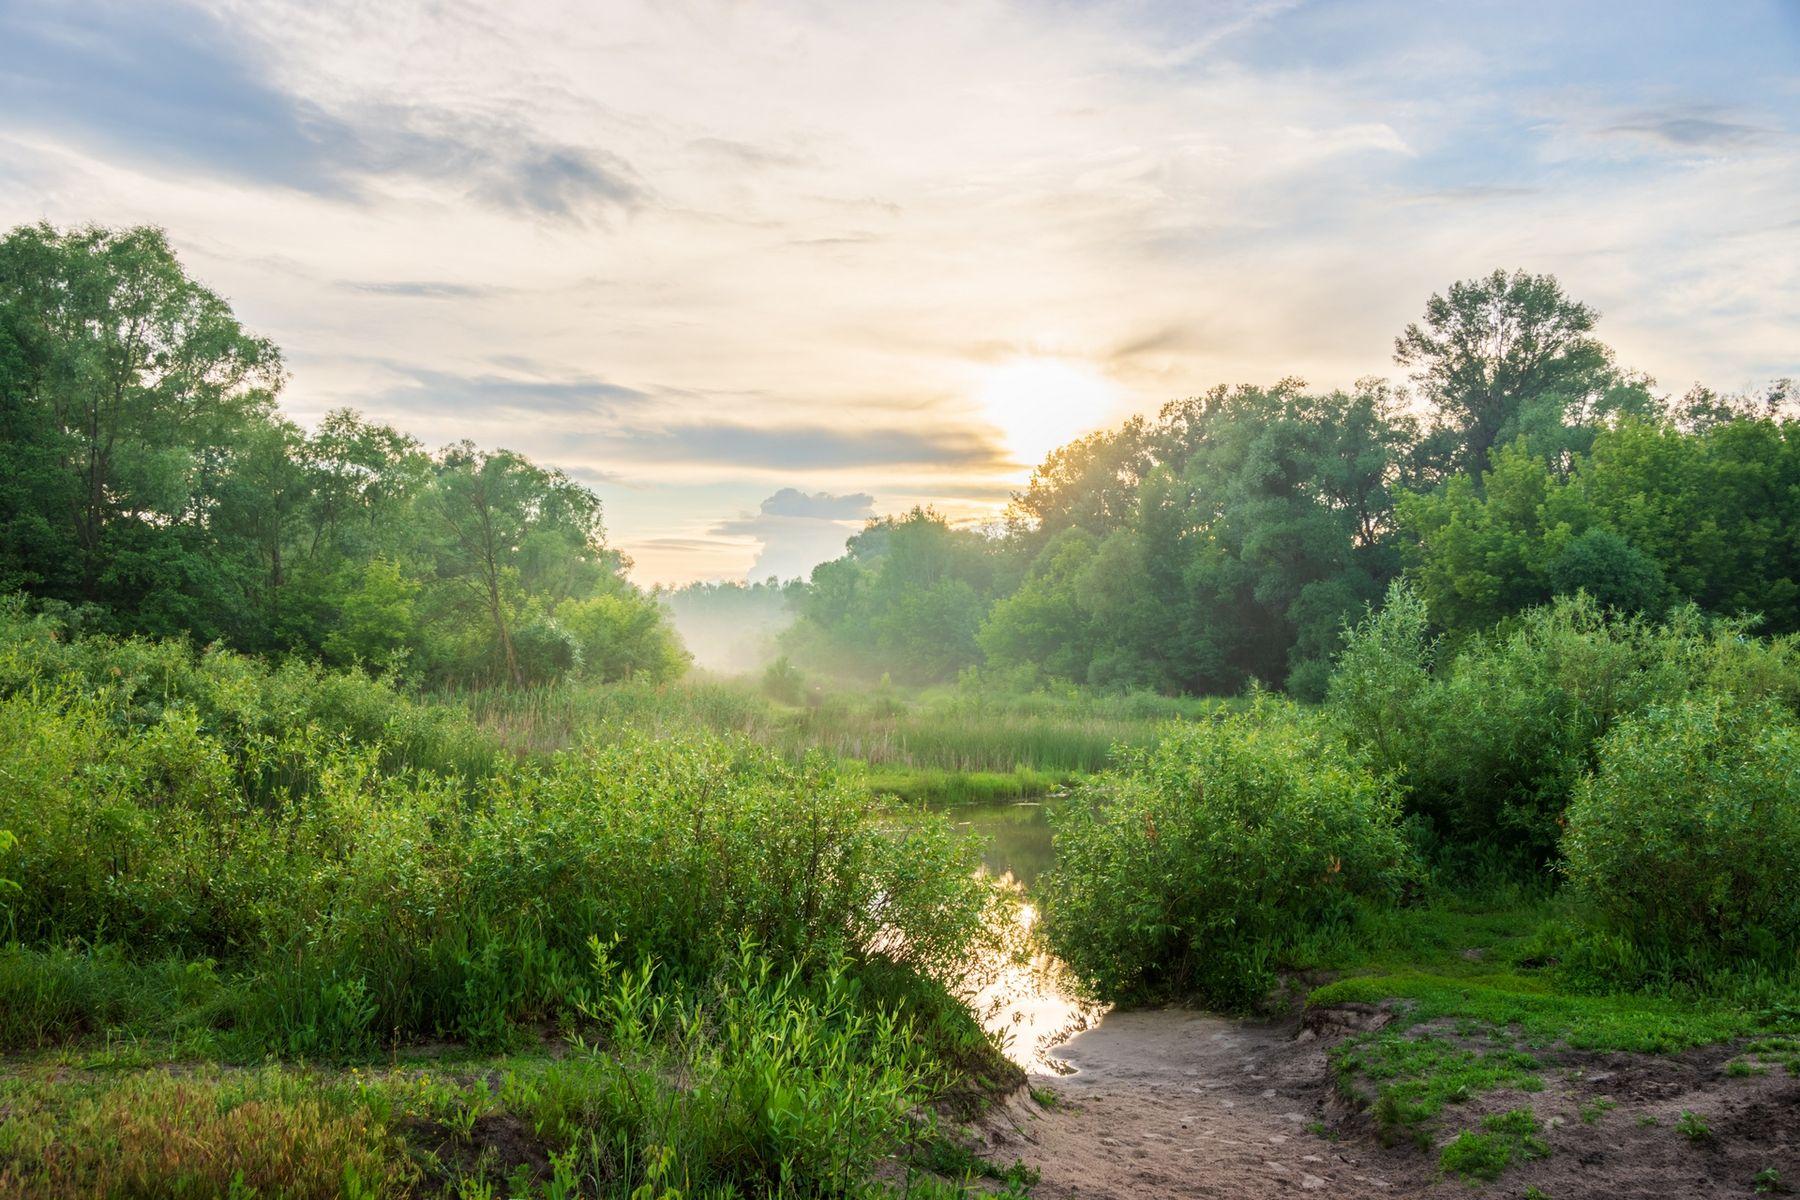 Вечер после дождя лето вечер природа пейзаж дымка солнце река Усманка Воронеж